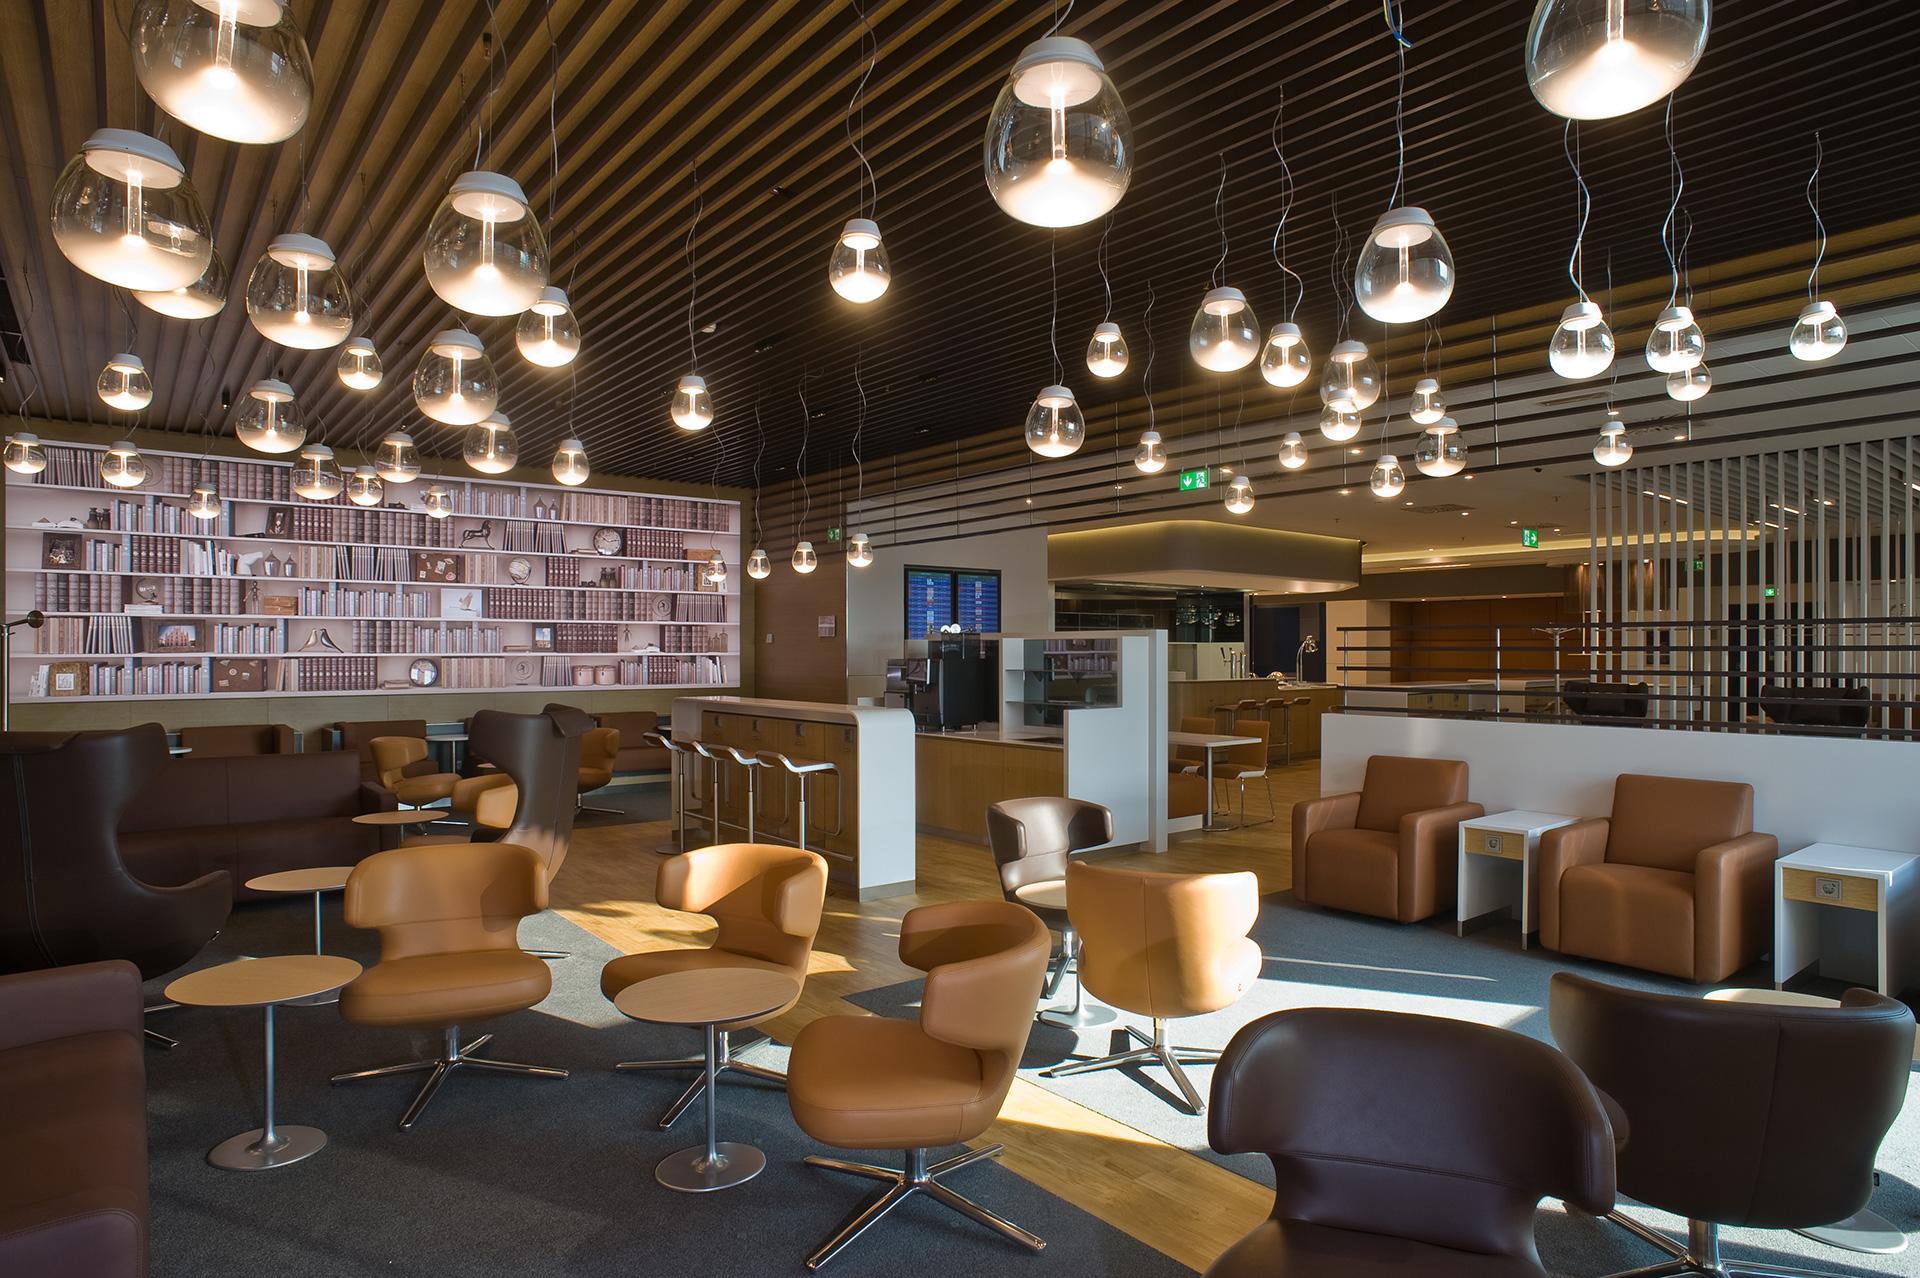 25-C-Lufthansa-Lounge-Malpensa